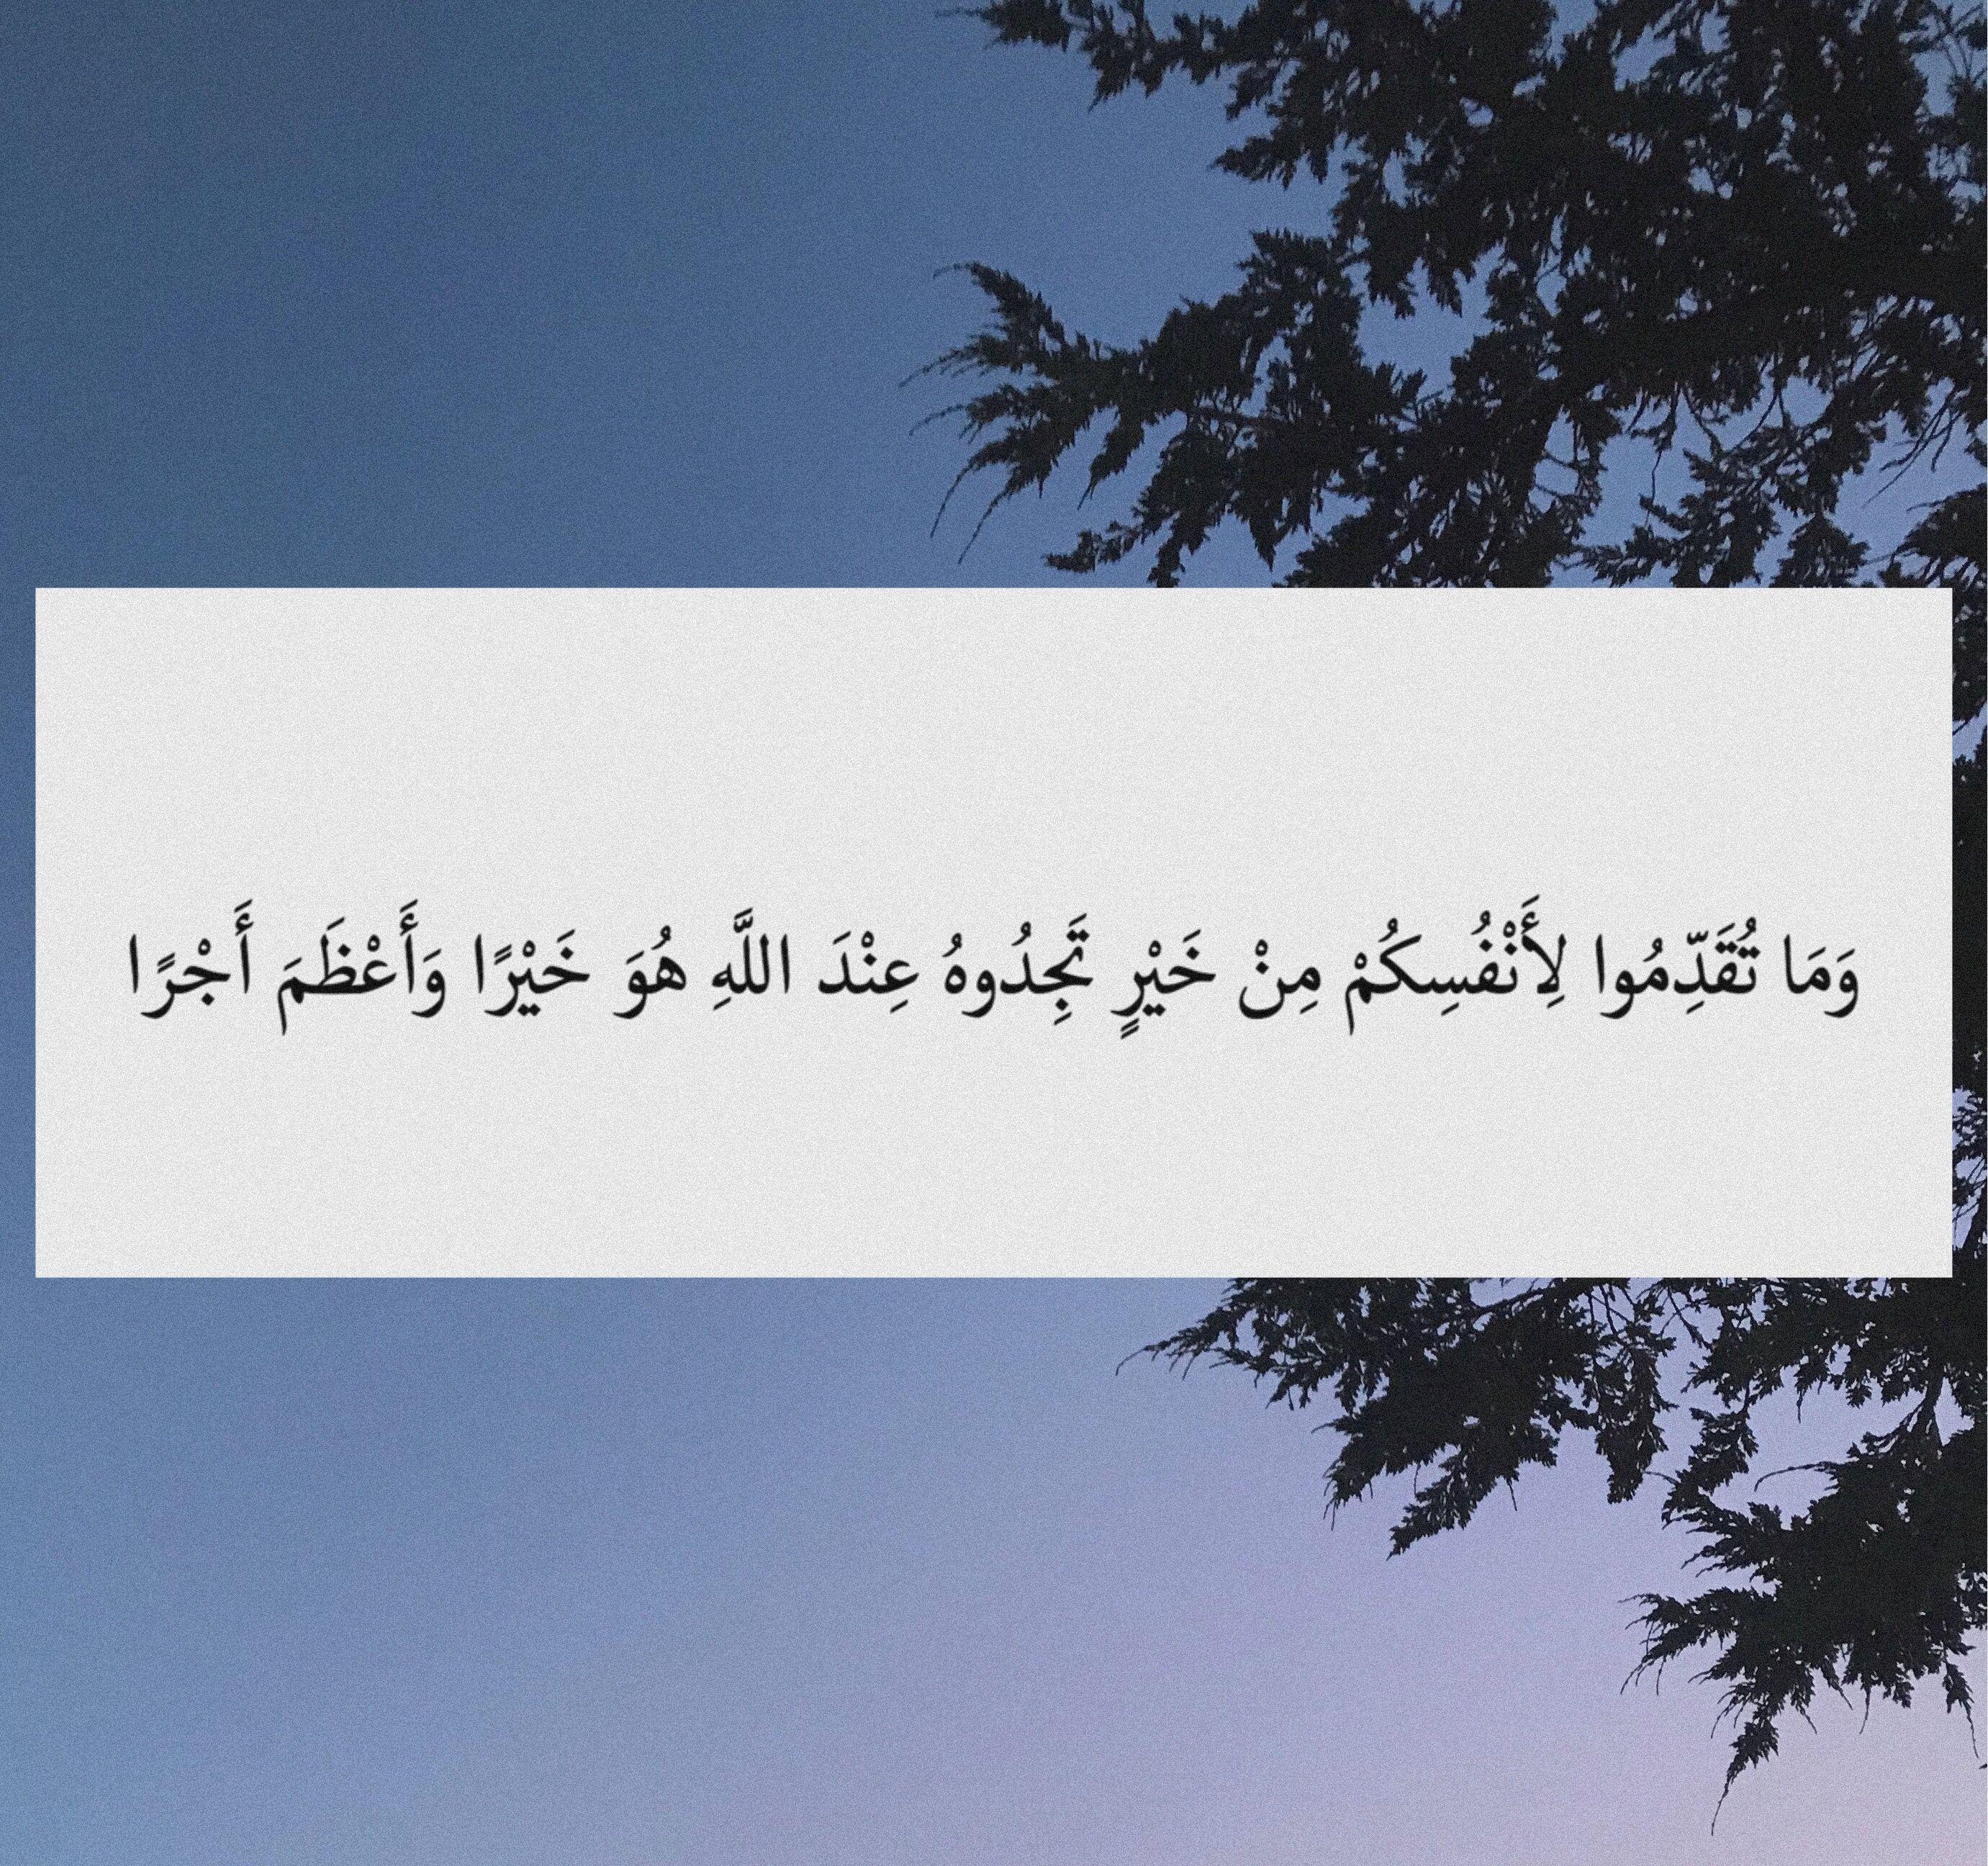 Pin By White Paperr1 On أدعية و أذكار Quran Quotes Quran Quotes Inspirational Quran Quotes Verses